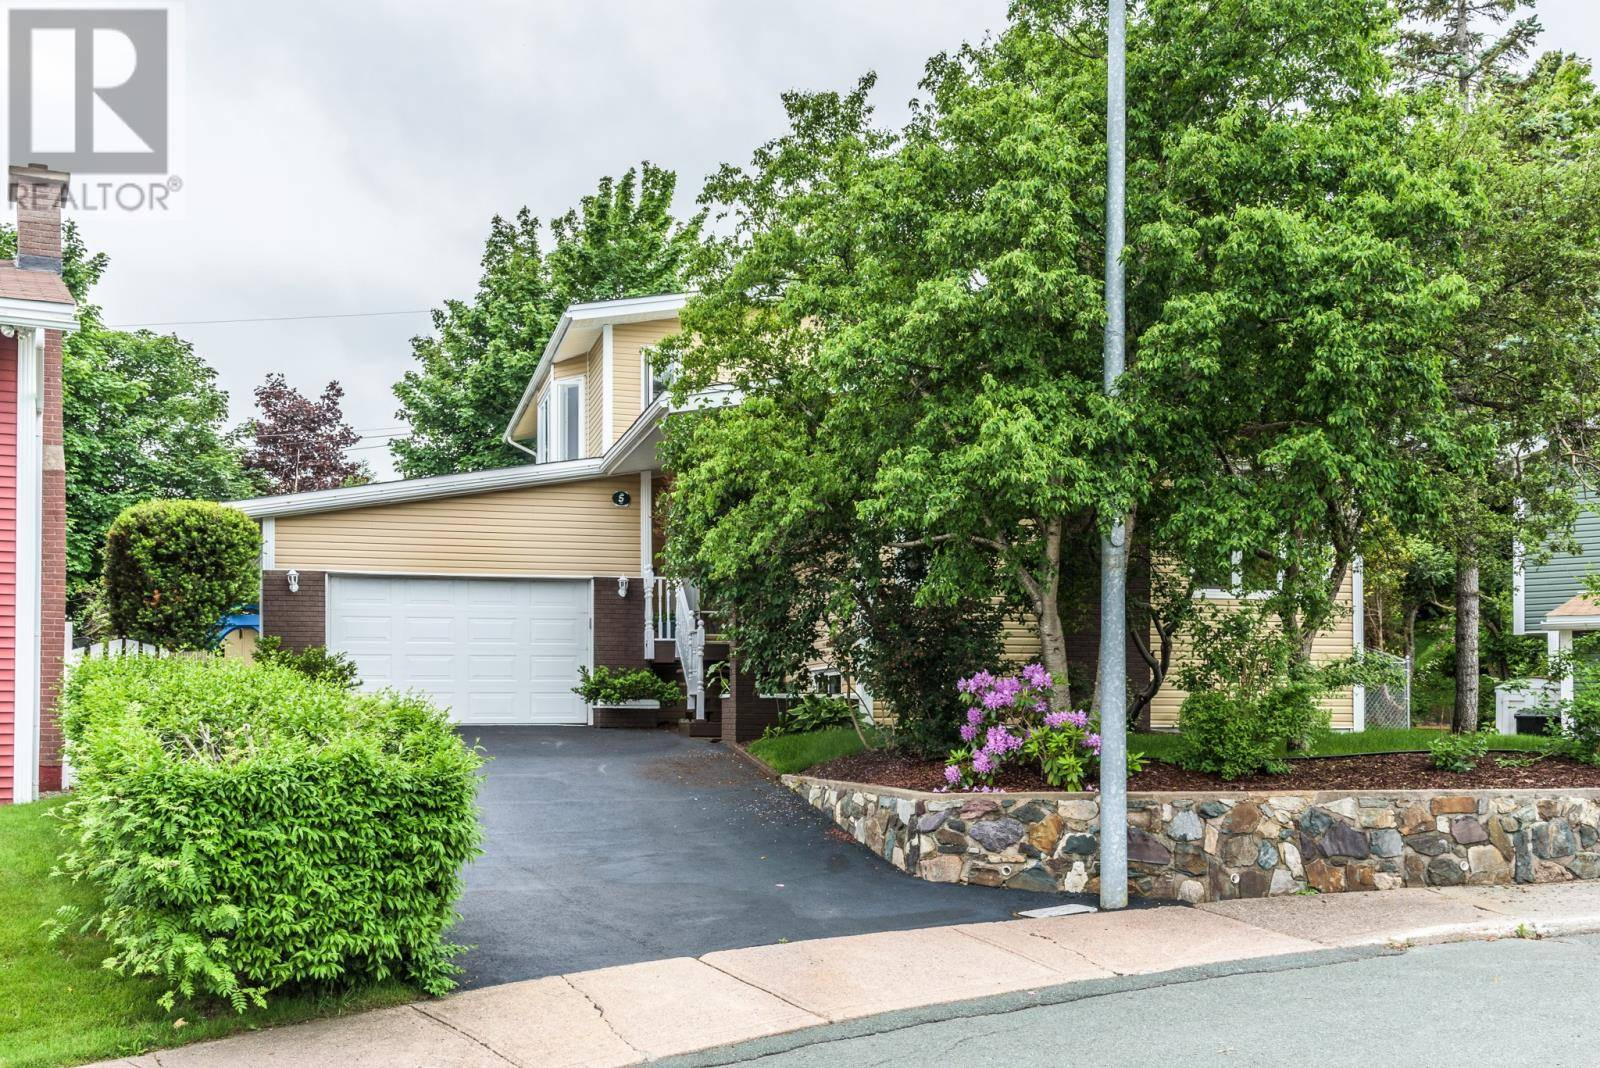 House for sale at 5 Brigus Pl St. John's Newfoundland - MLS: 1199477